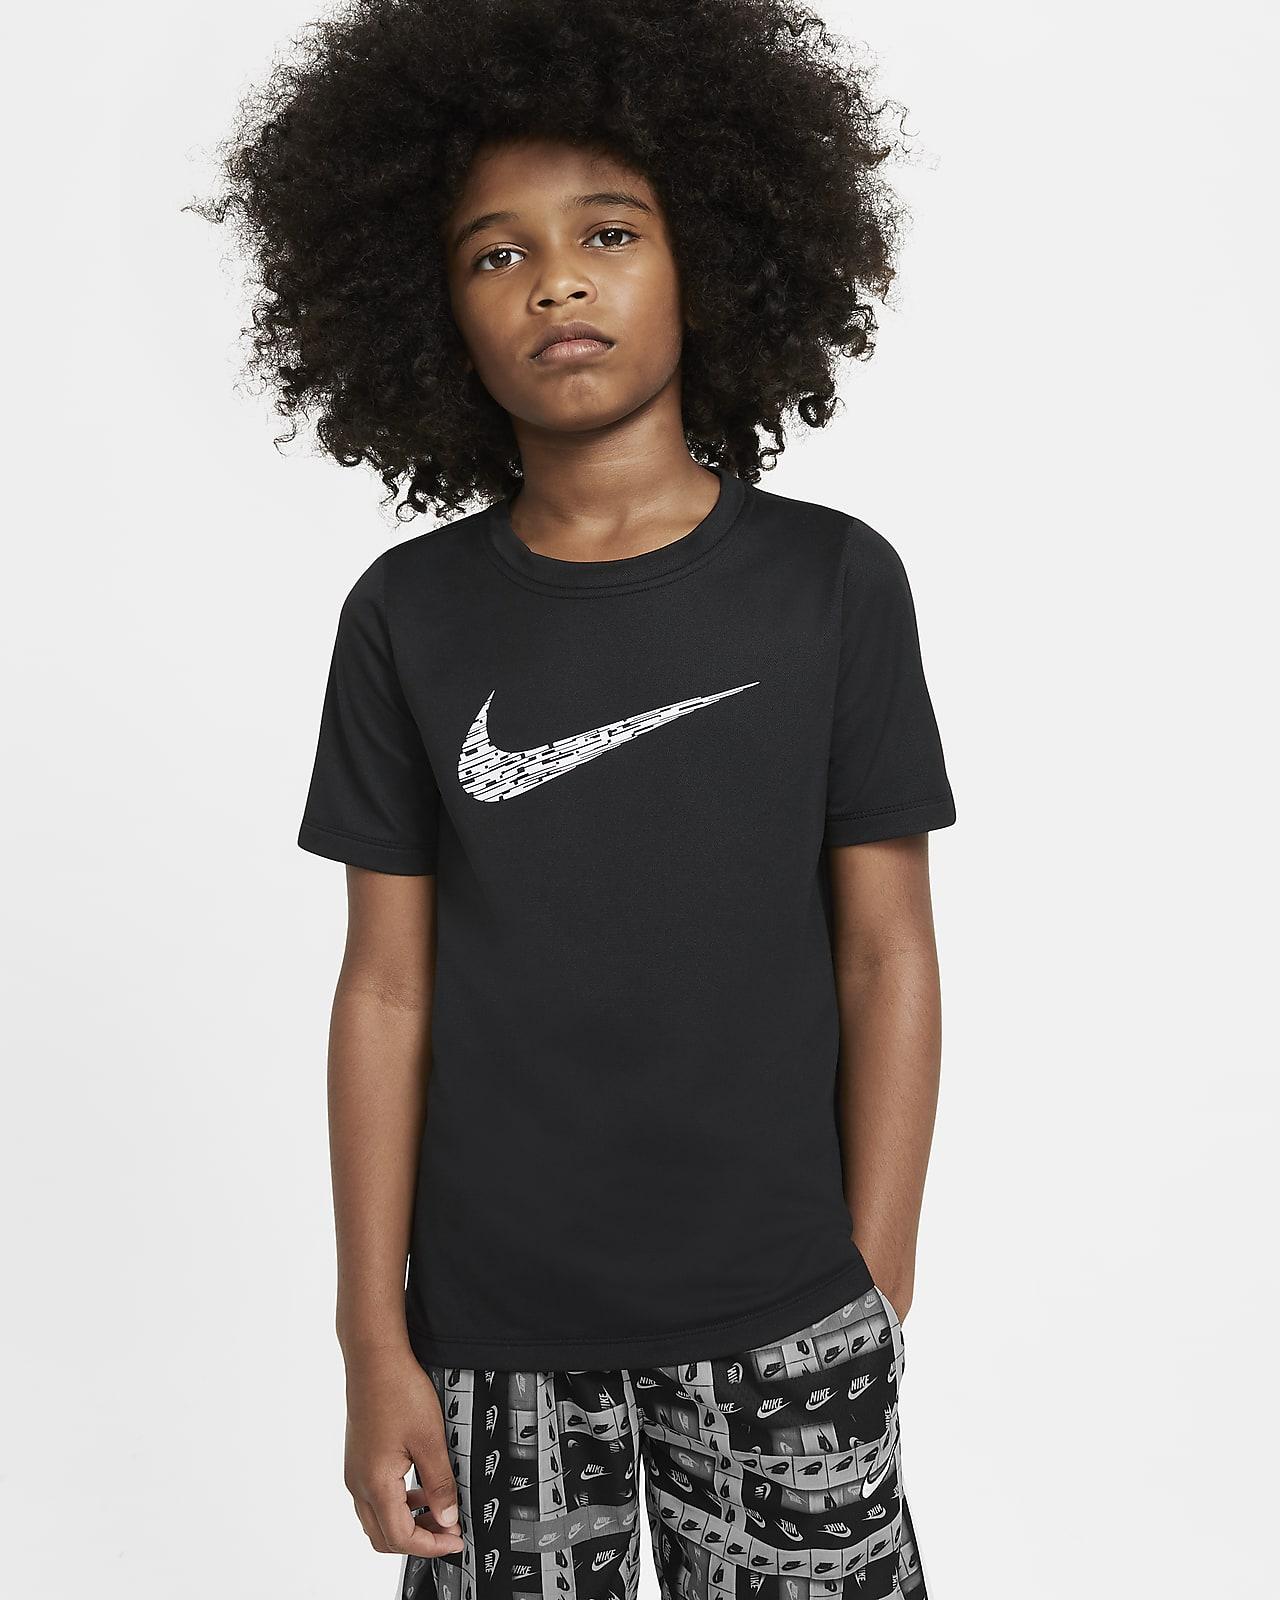 Nike Older Kids' (Boys') Short-Sleeve Training Top